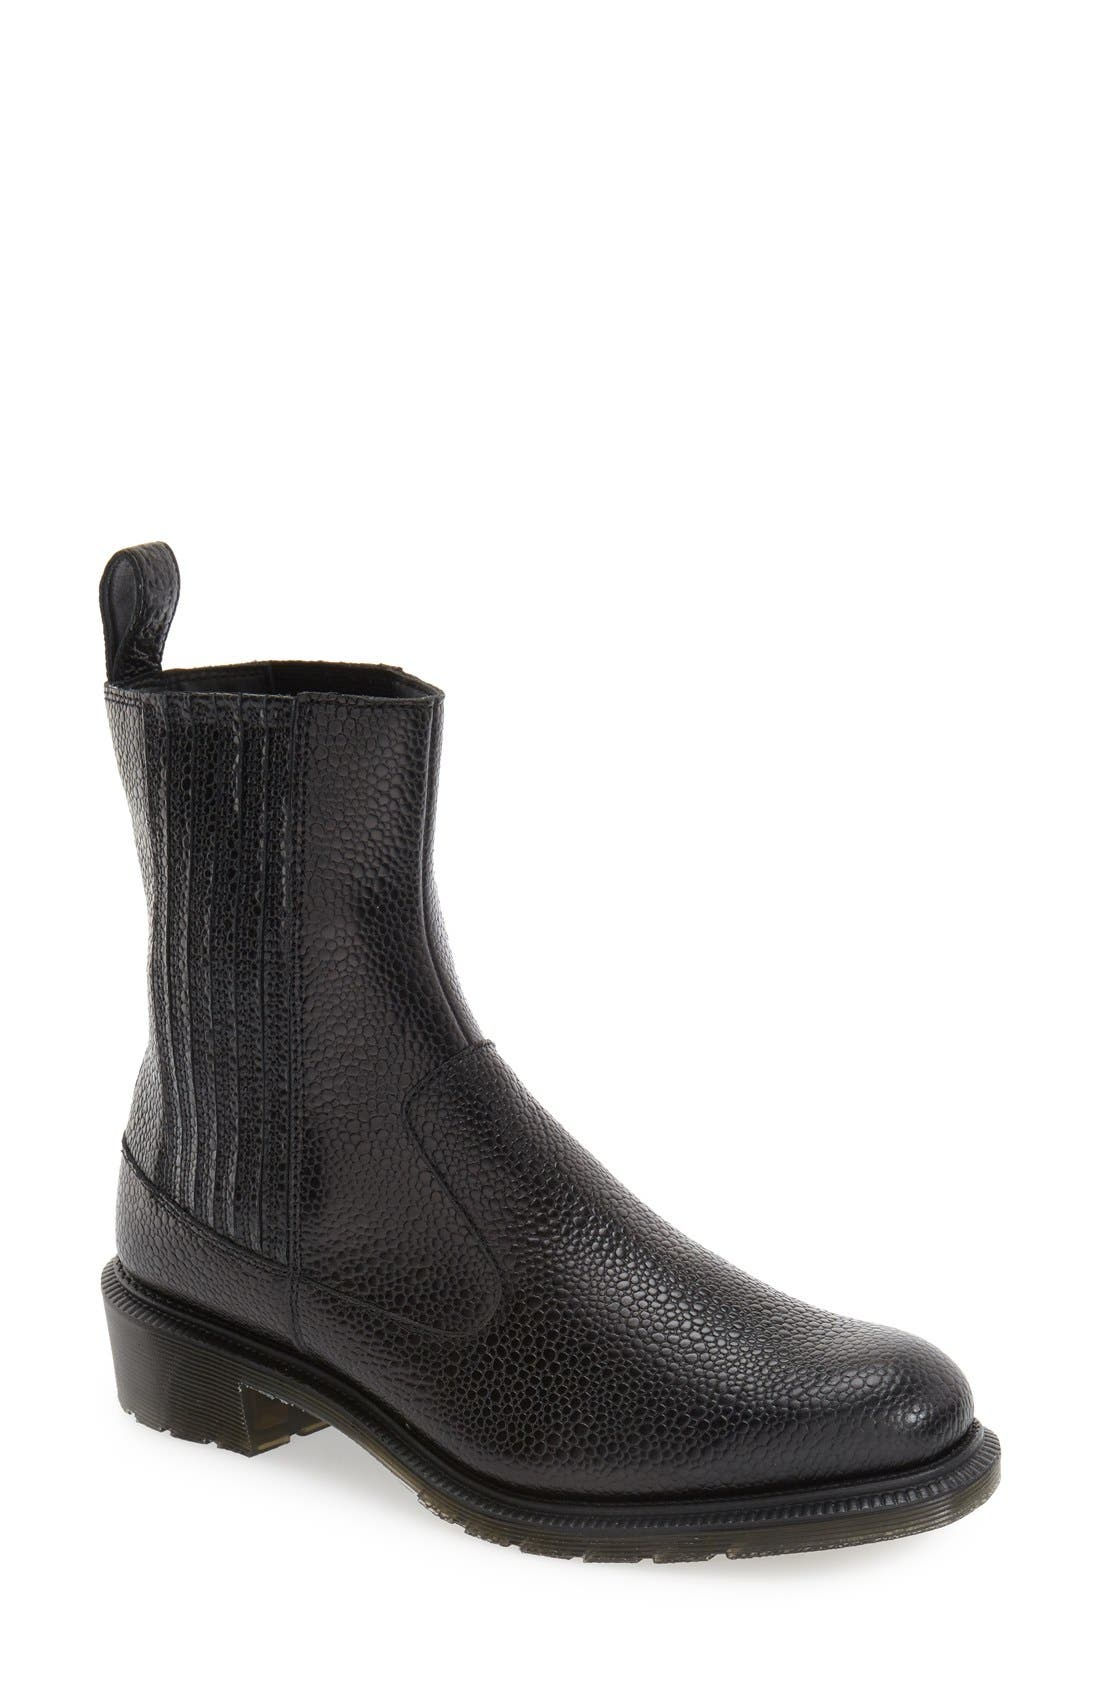 Dr. Martens 'Eleanore' Chelsea Boot